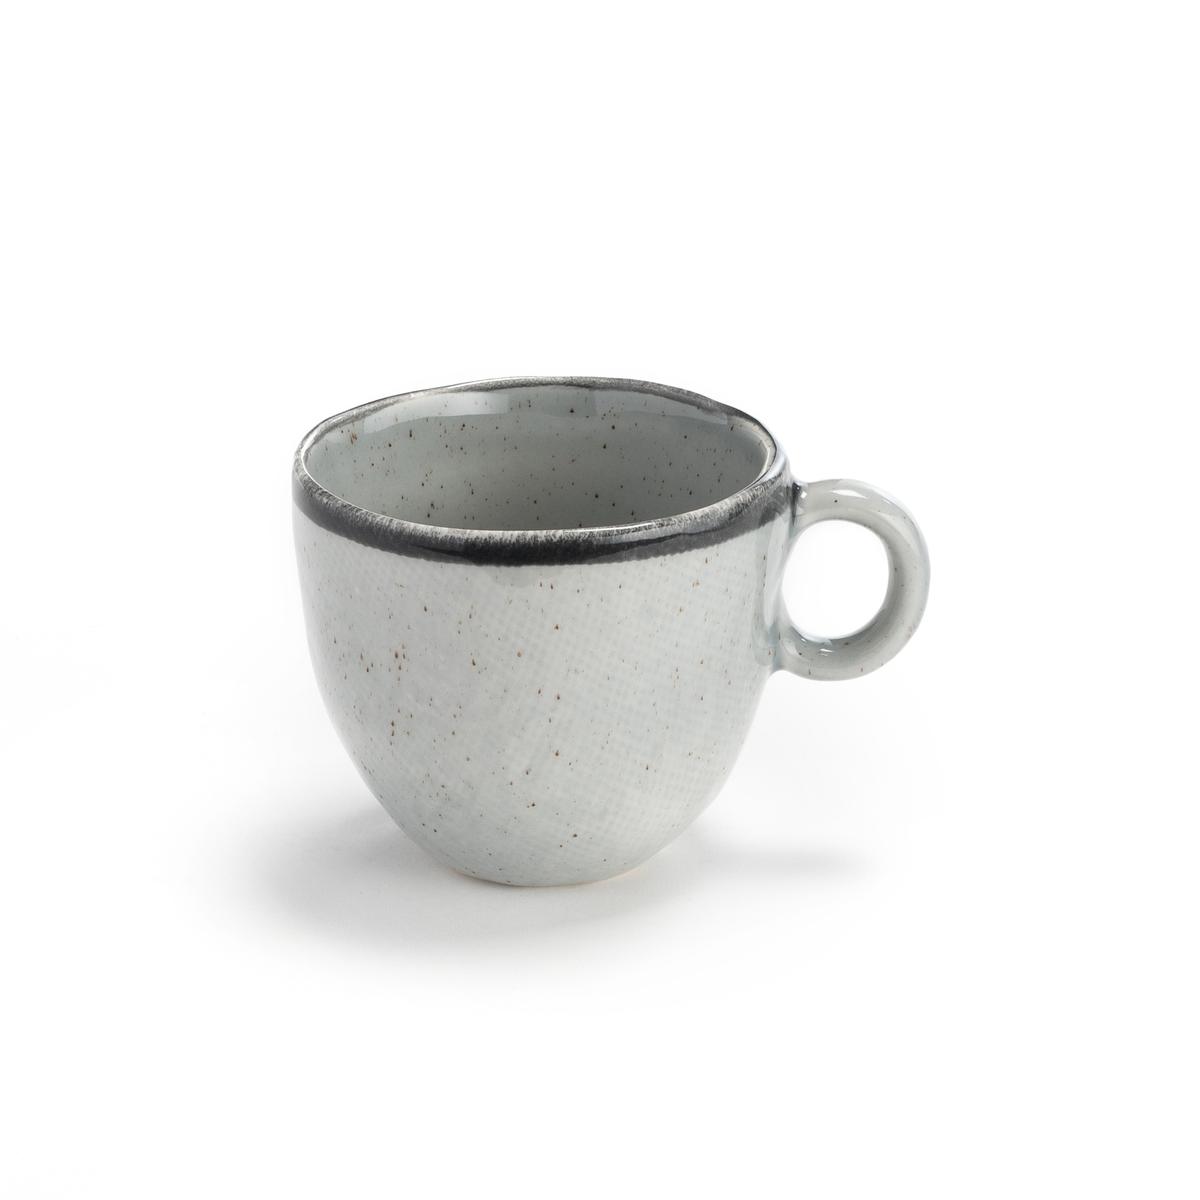 Чашки La Redoute Из керамики Anika единый размер серый чашки la redoute из керамики shima единый размер зеленый